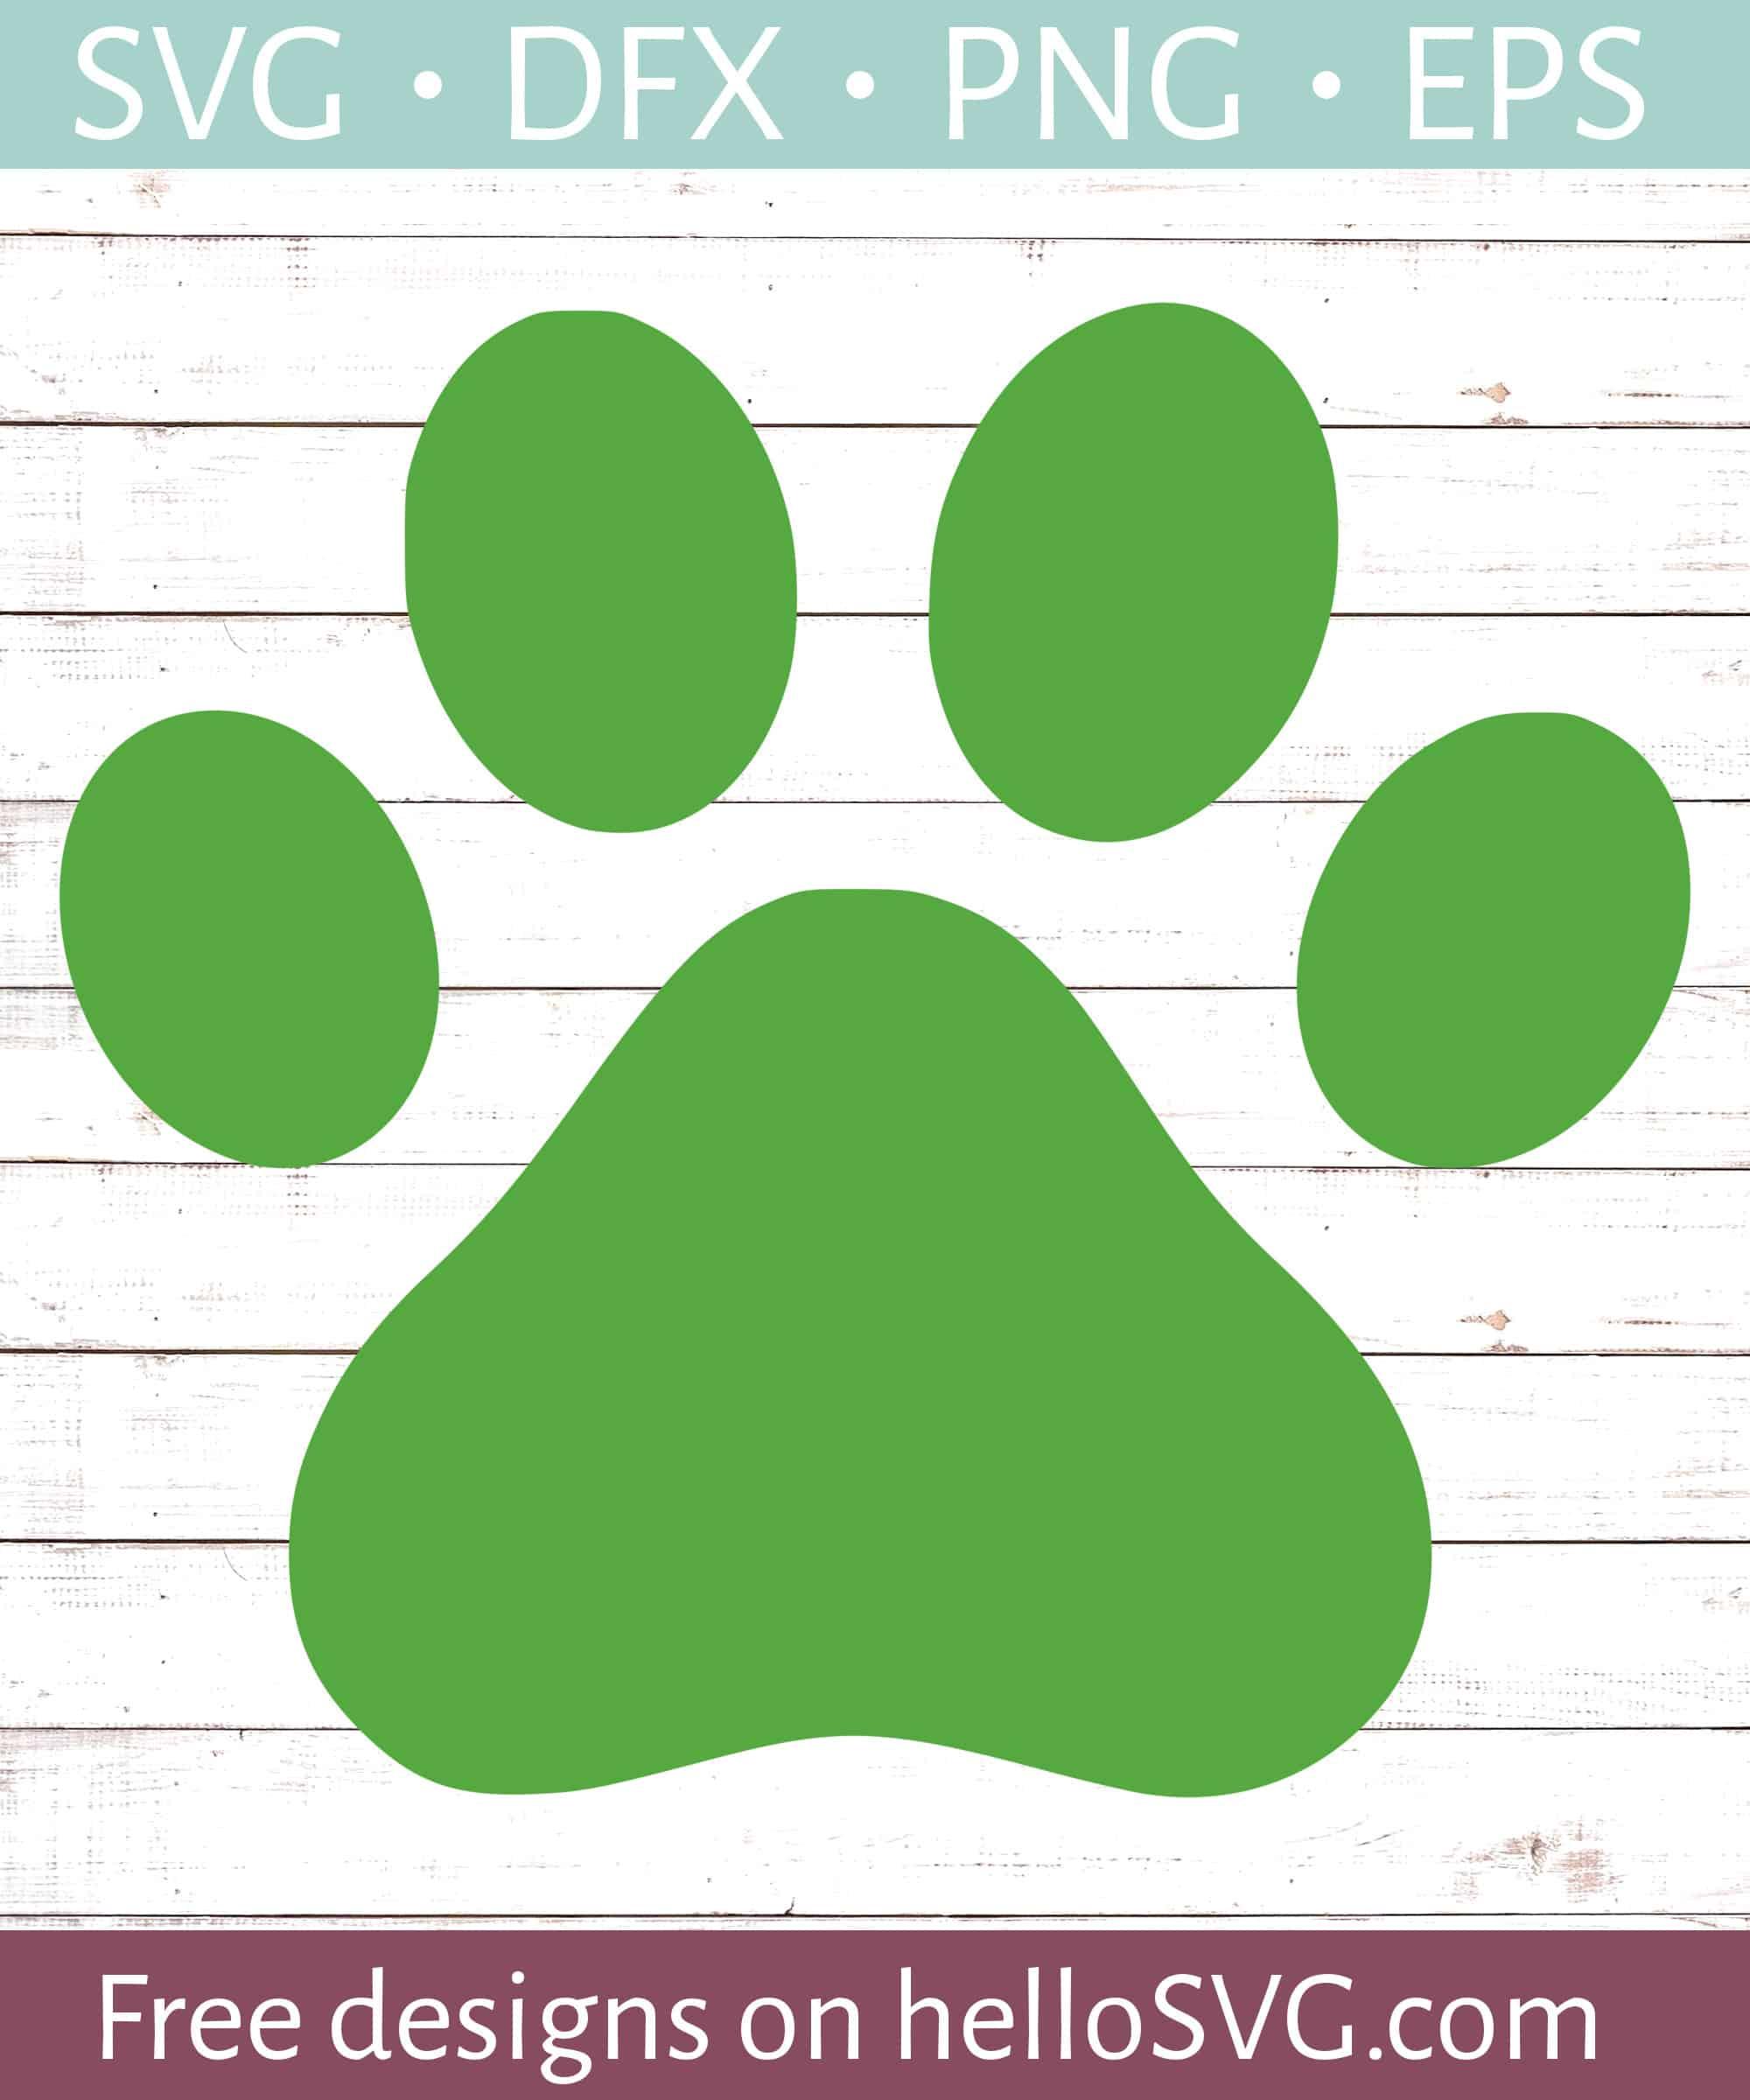 Dog Paw Svg Free : Print, Files, HelloSVG.com